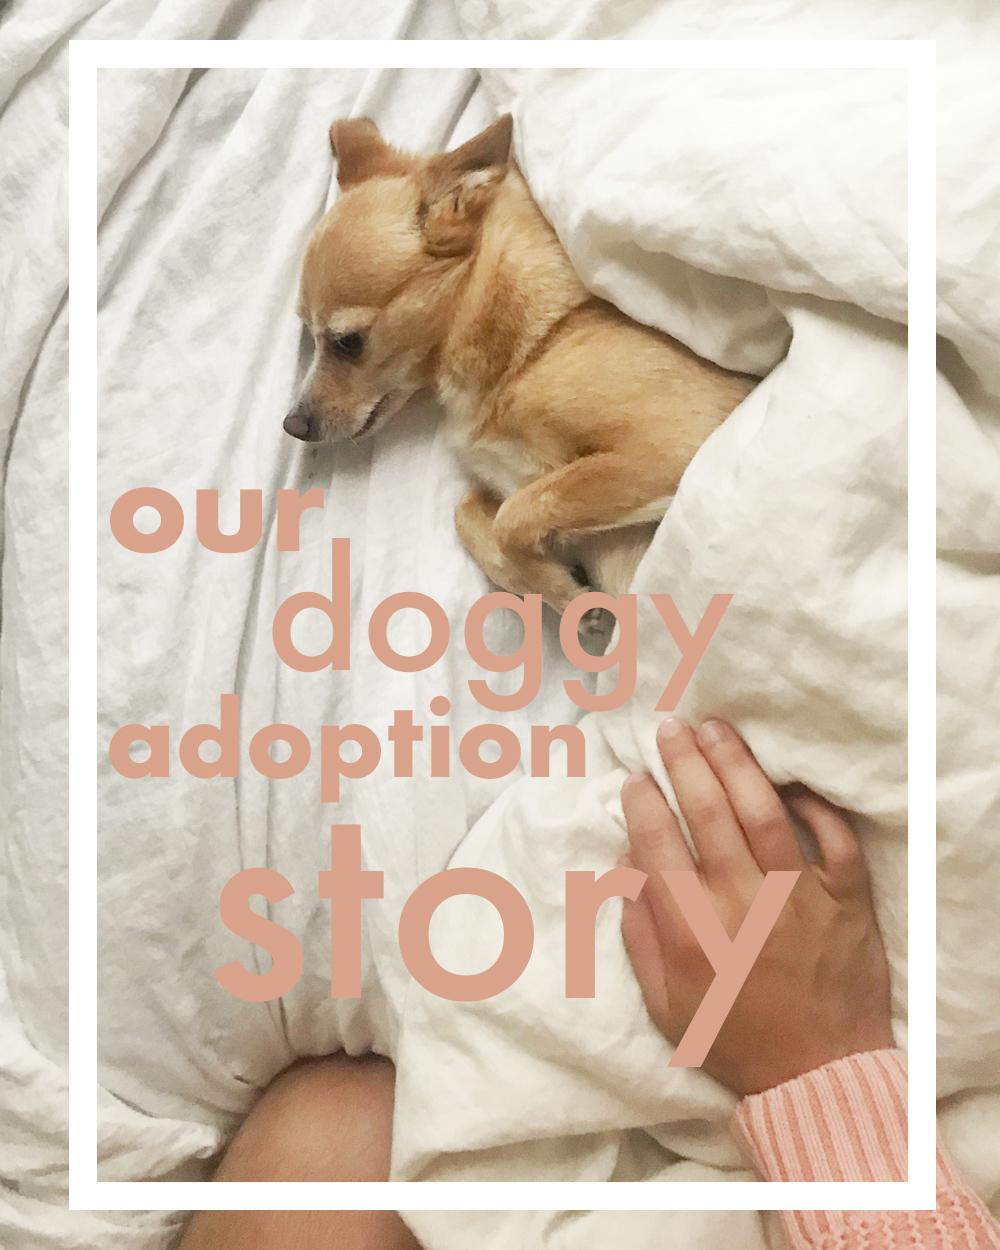 dog adoption rescue story